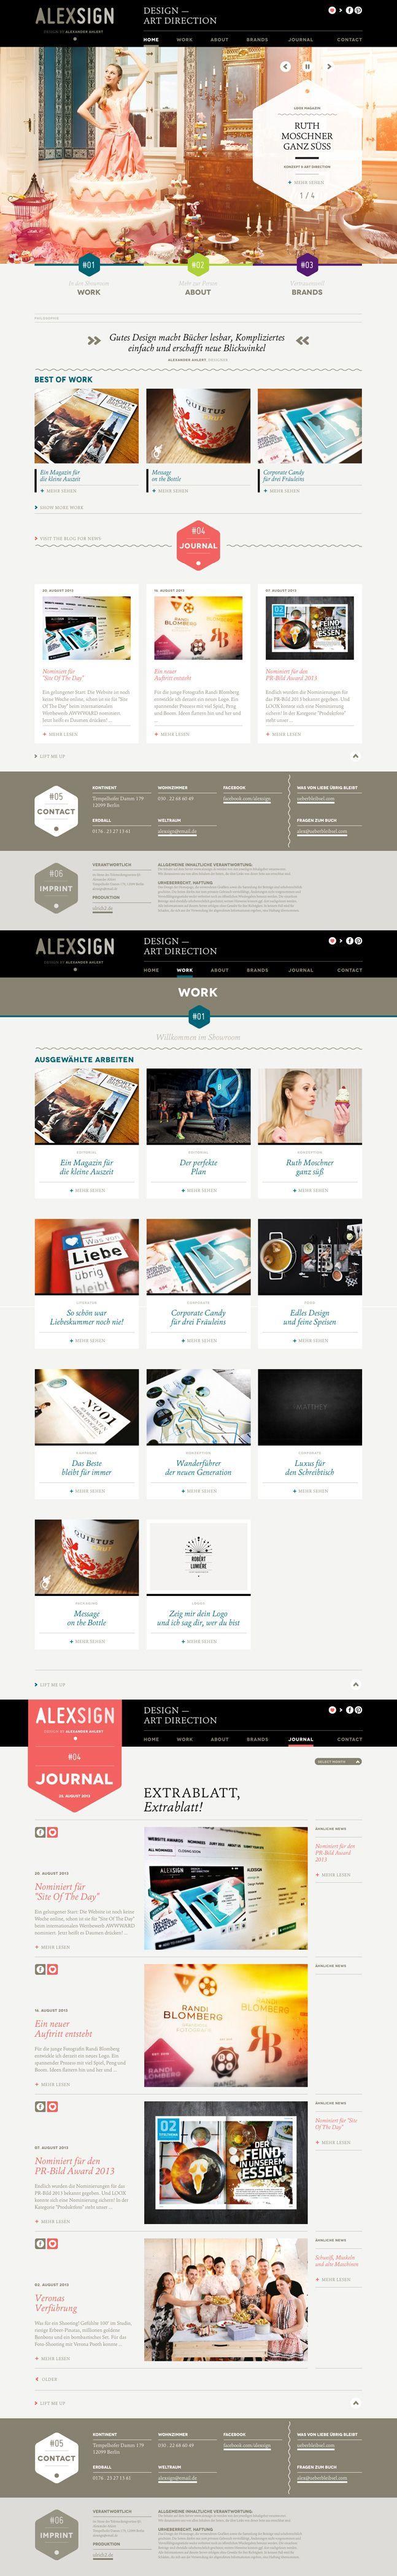 25 August 2013 ALEXSIGN by Alexander Ahlert http://www.cssdesignawards.com/css-web-design-award-winner.php?id=22173 #Portfolio #Scroll #ArtDirection